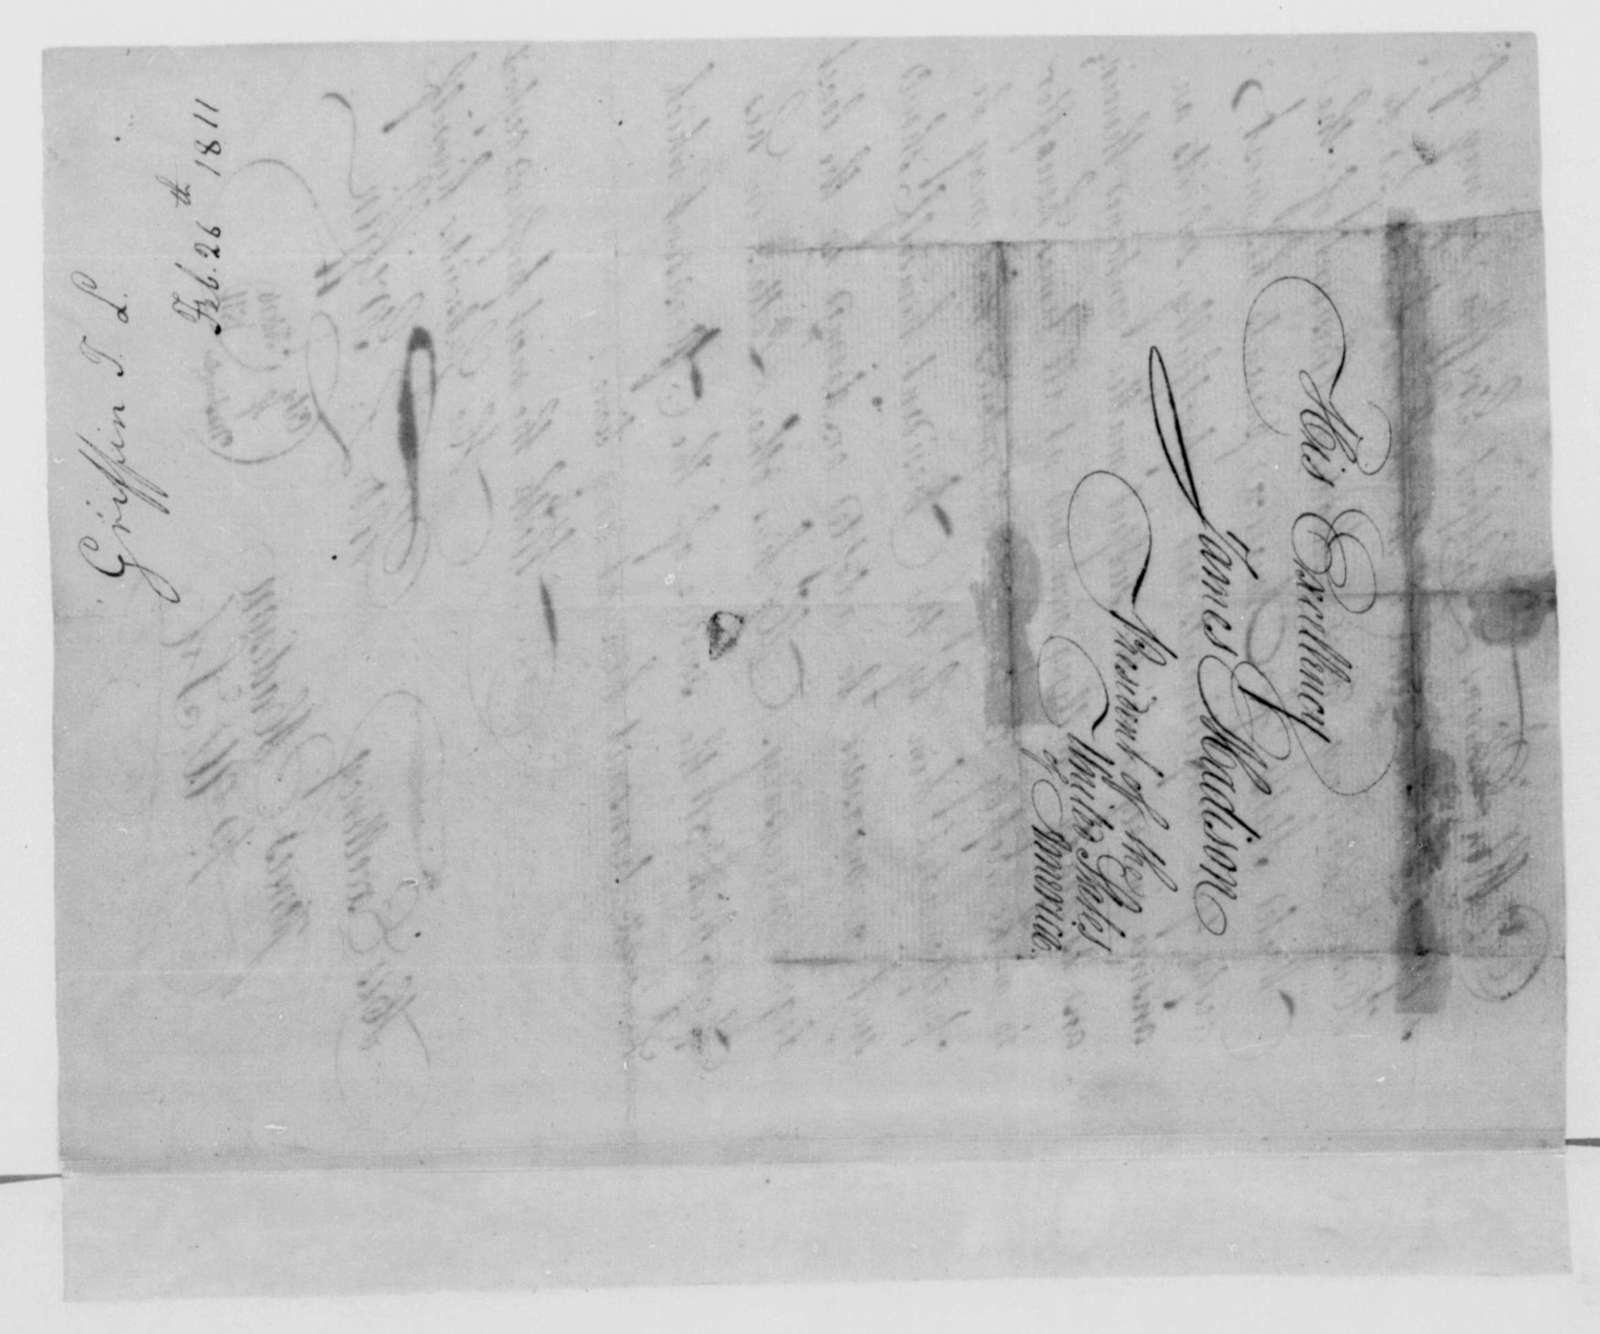 Thomas L. Griffin to James Madison, February 26, 1811.